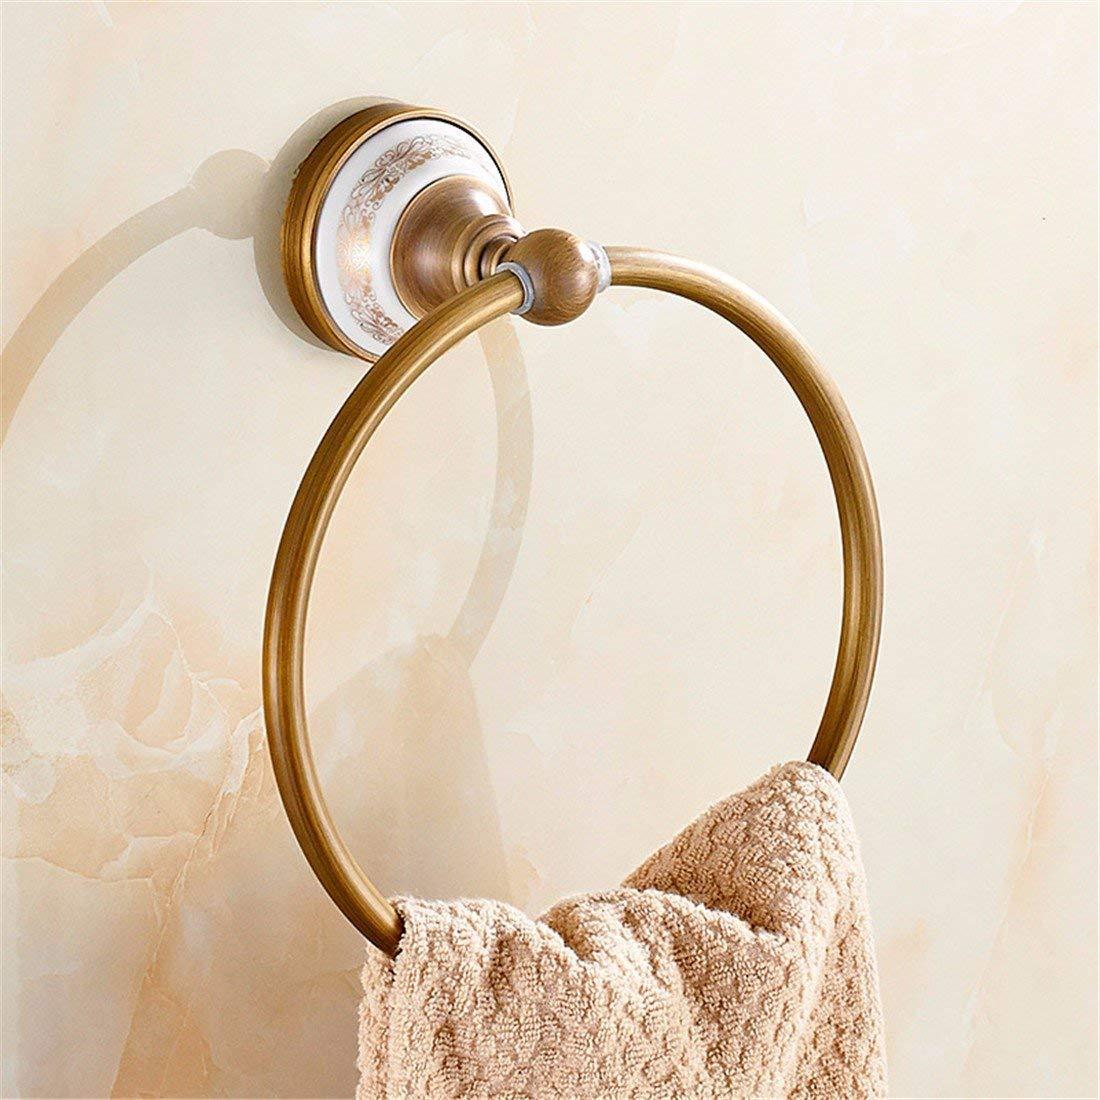 LAONA European style all copper antique drawing ceramic base, bathroom pendant set, toilet paper rack, towel rod,Towel ring